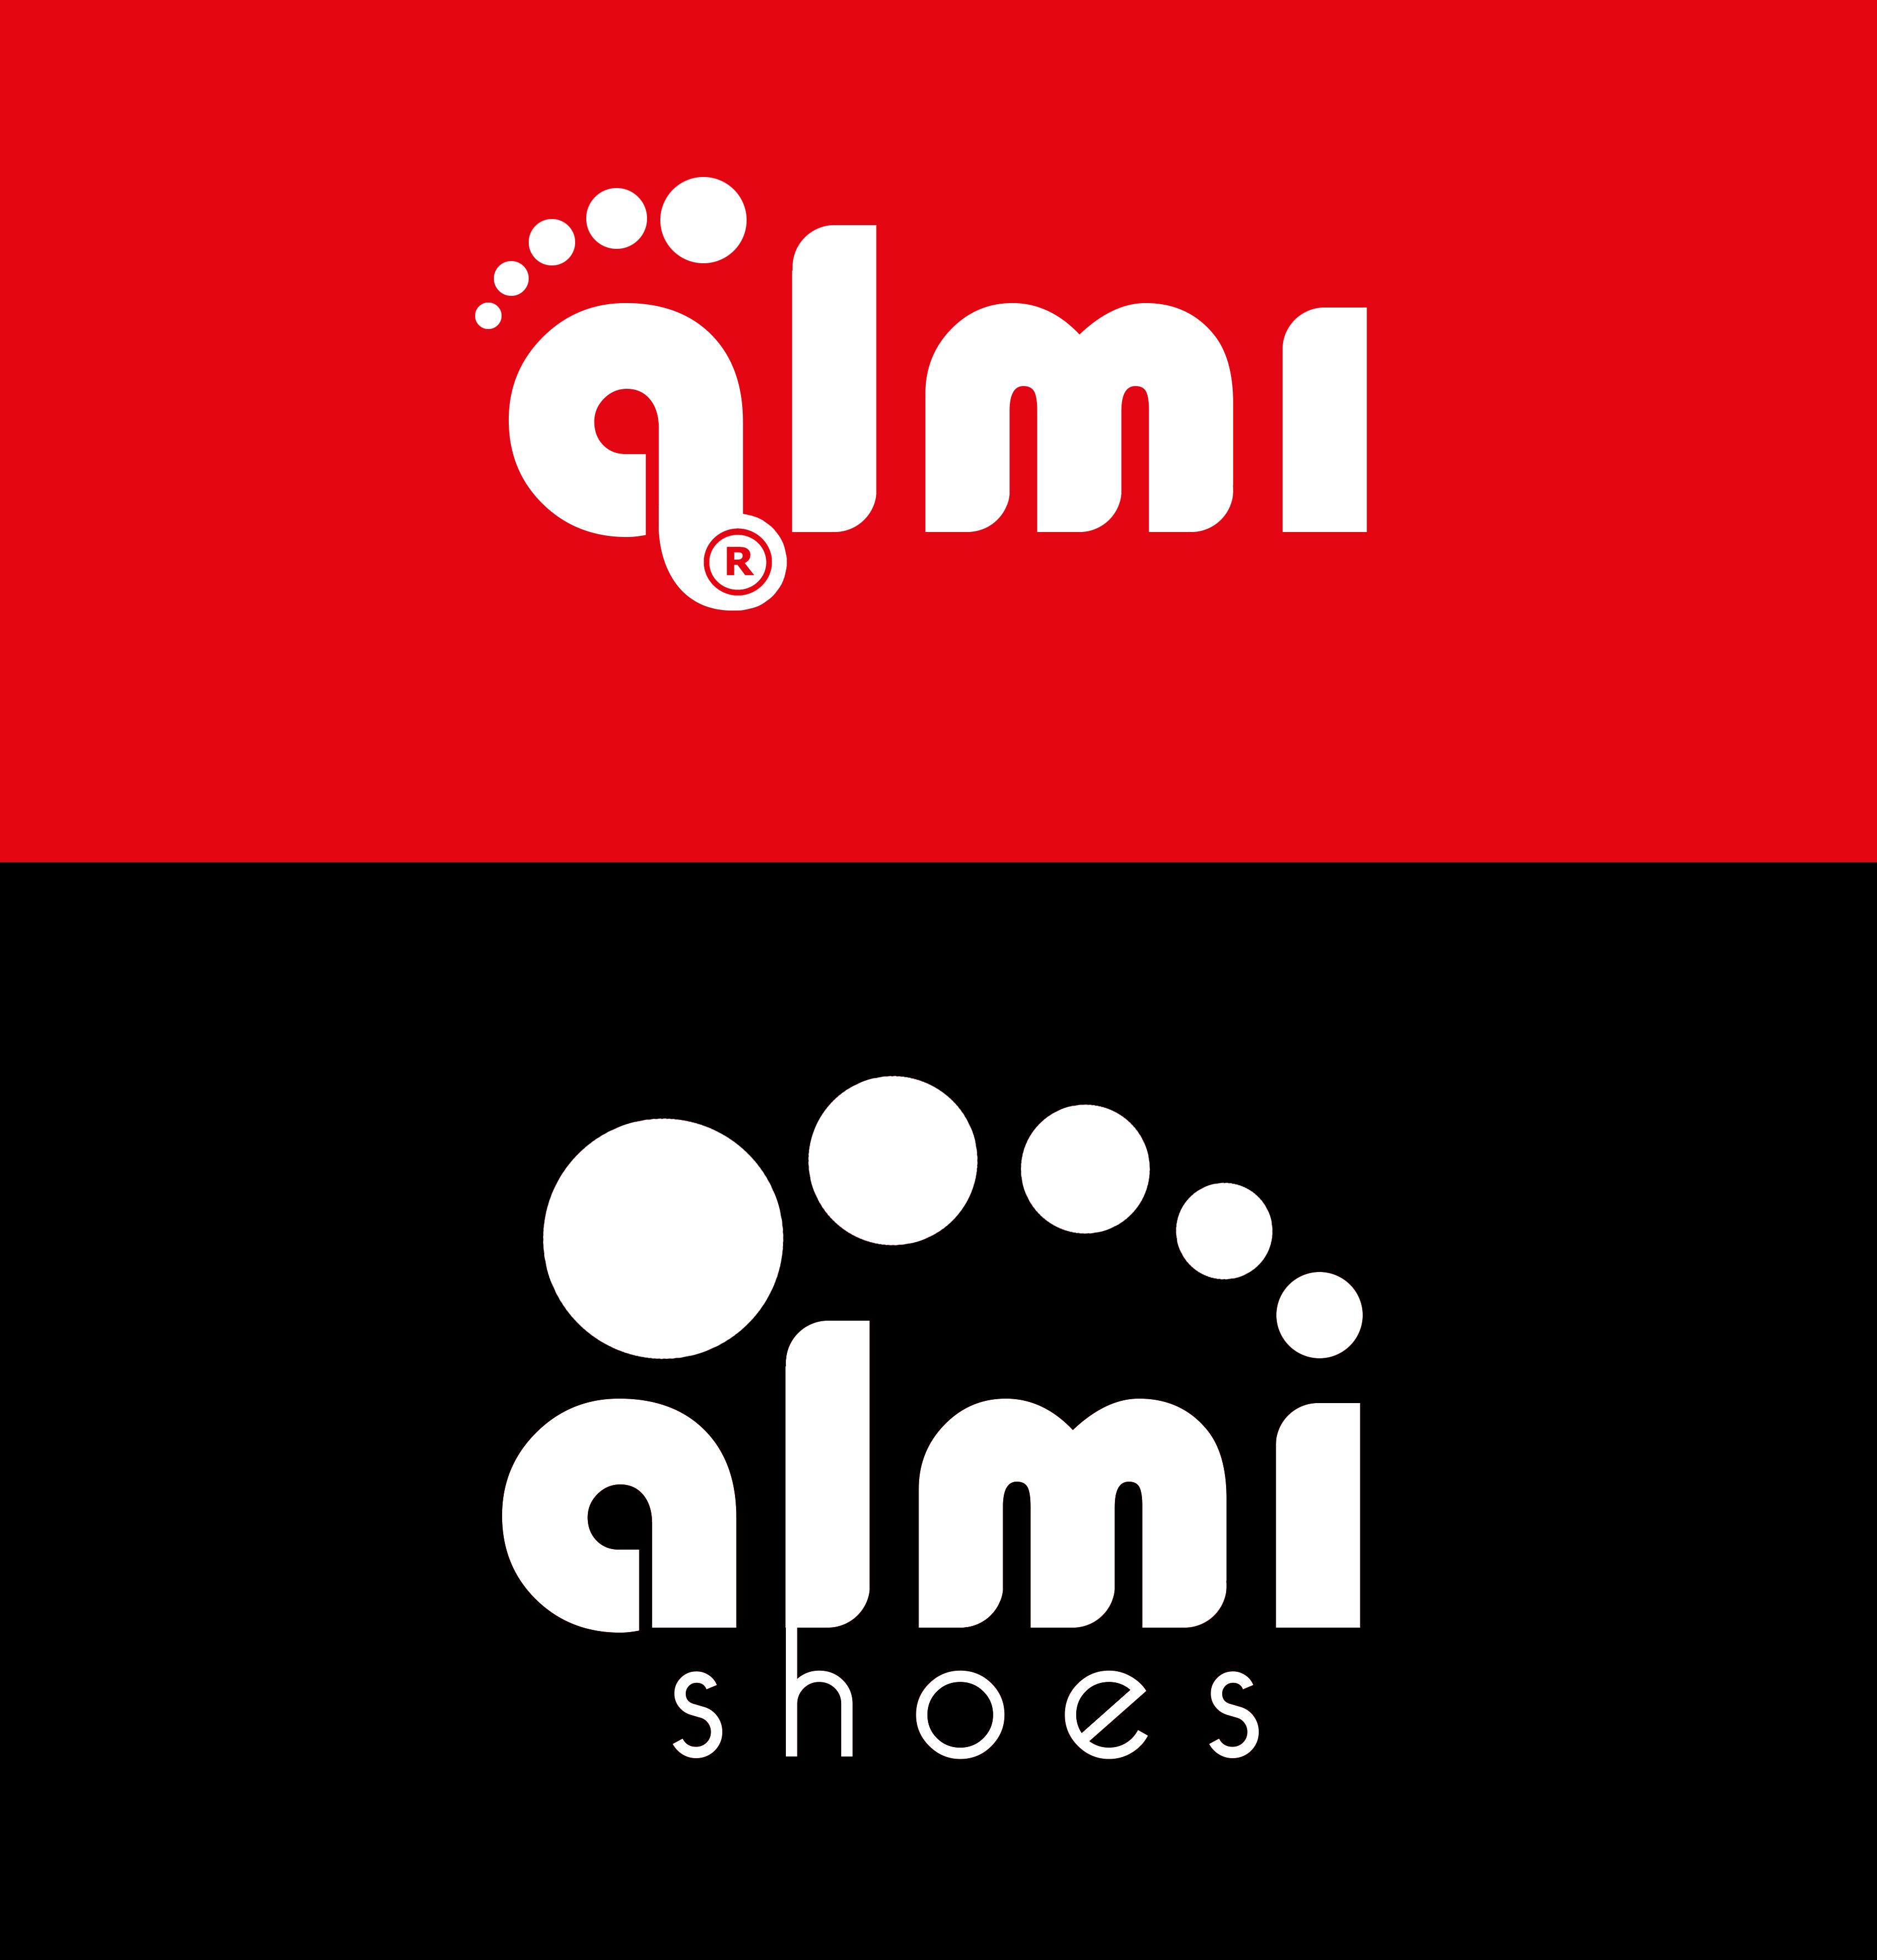 Дизайн логотипа обувной марки Алми фото f_24659f84d150ffa2.jpg